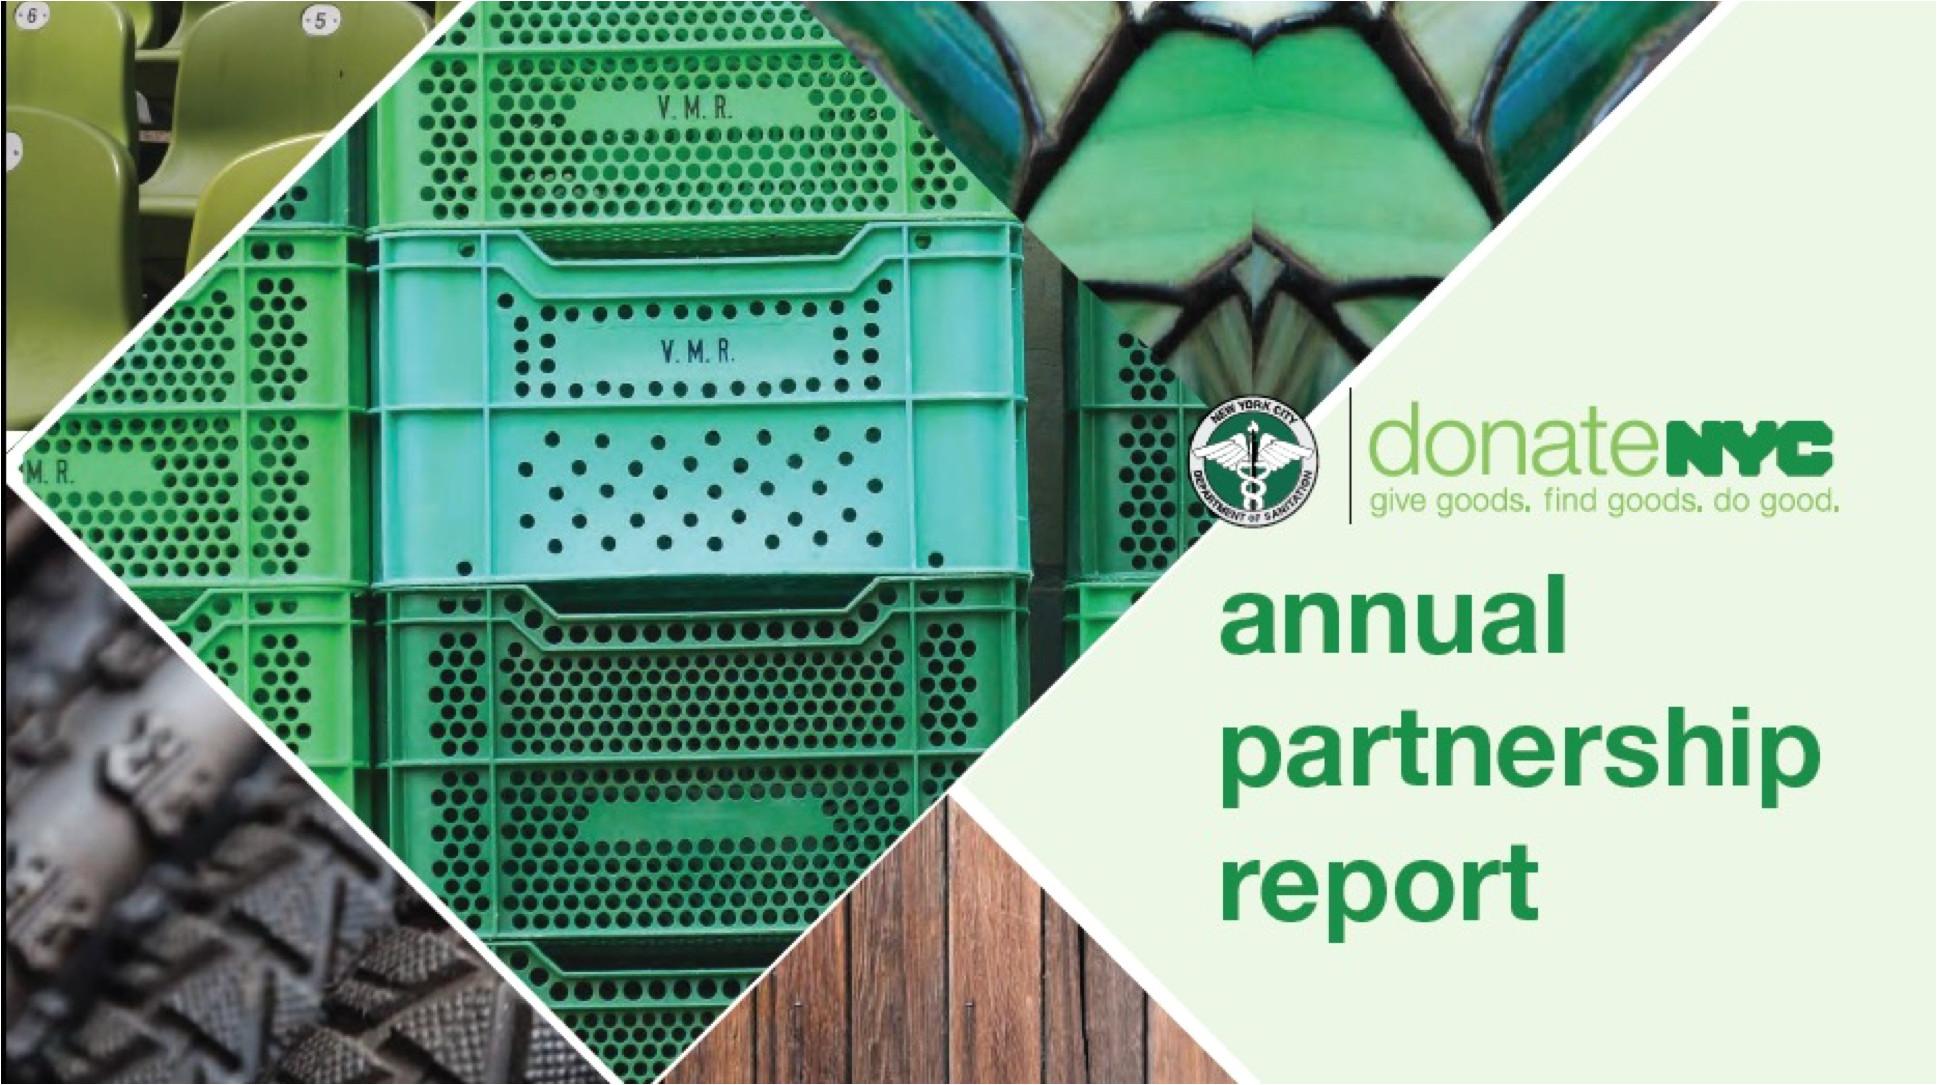 donatenyc partner impact 2017 18